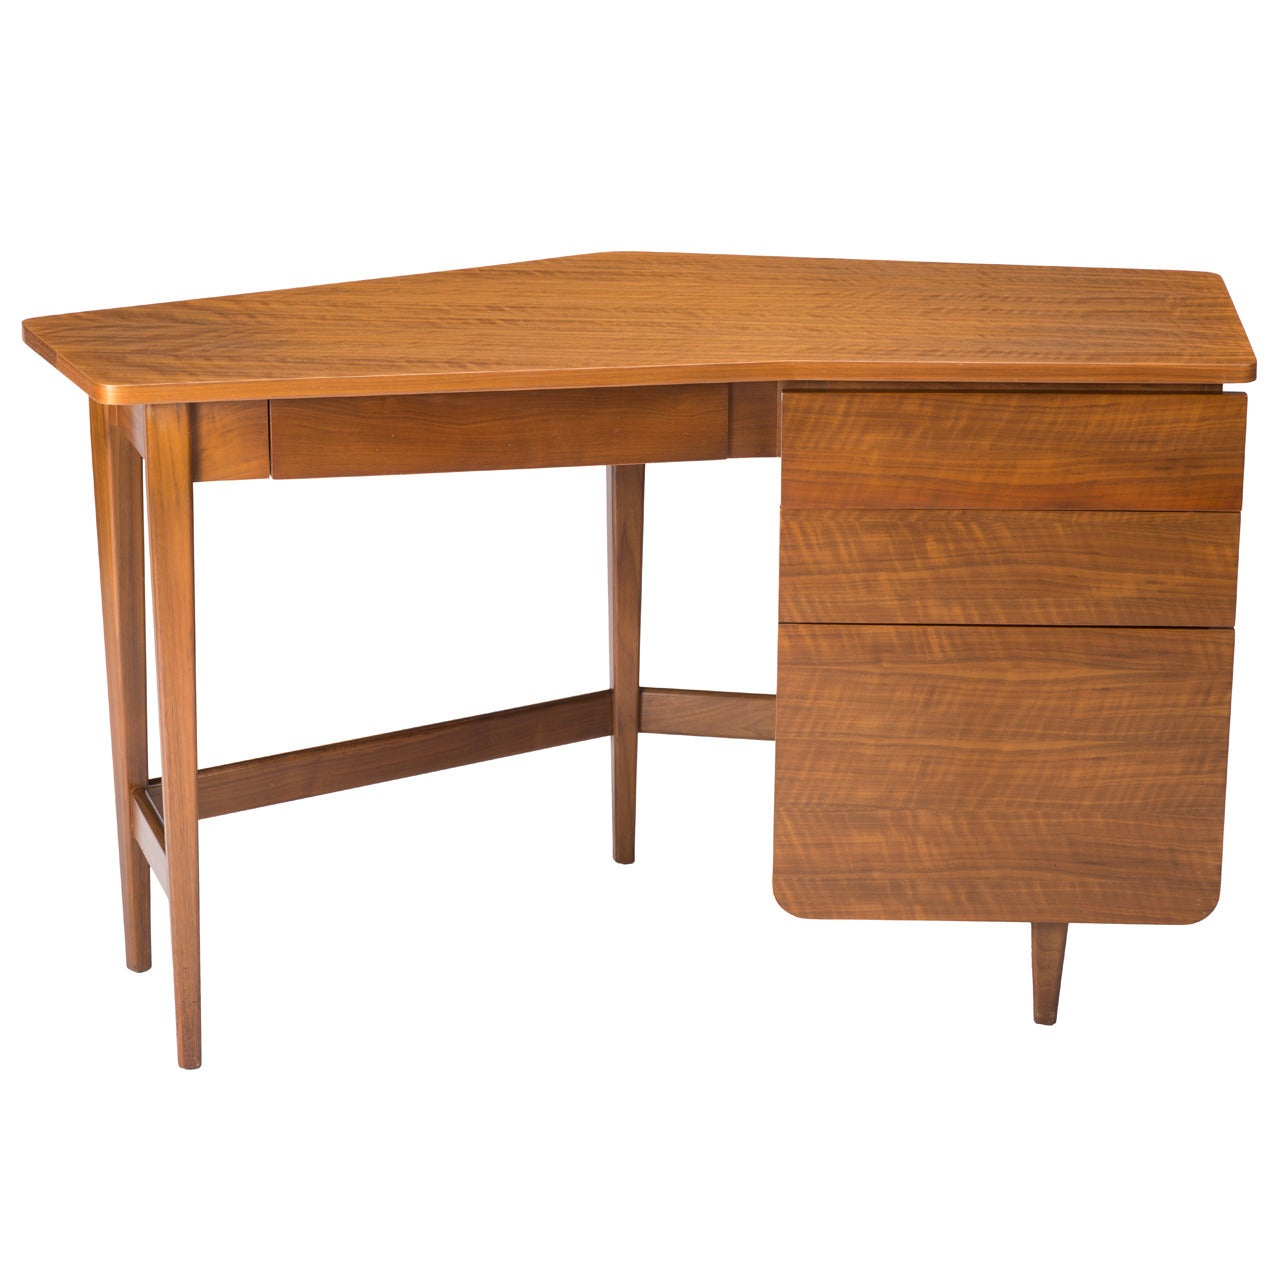 Desk by Bertha Schaefer for Singer and Sons